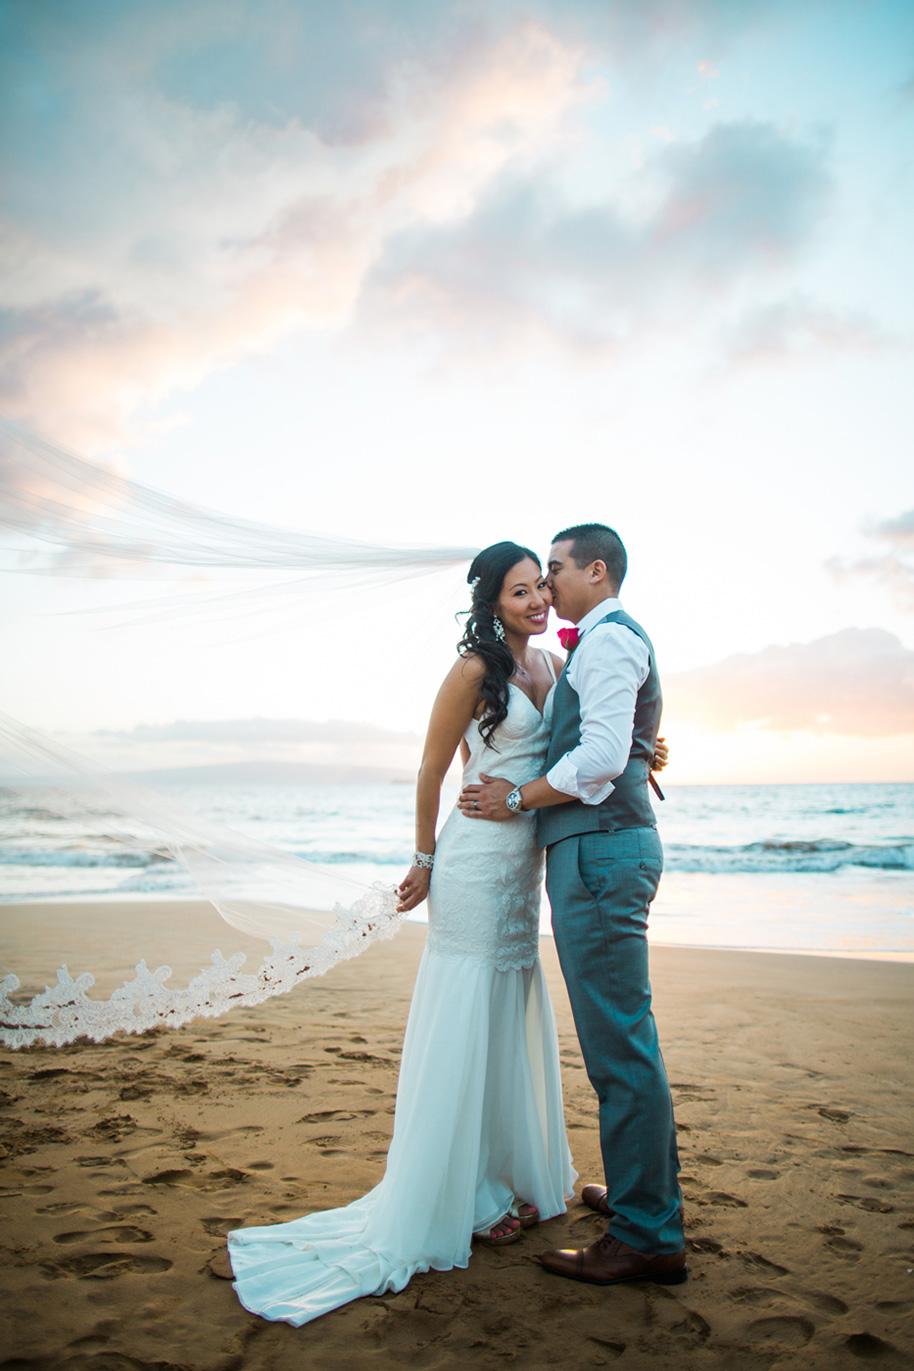 Maui-Beach-Wedding-041216-26